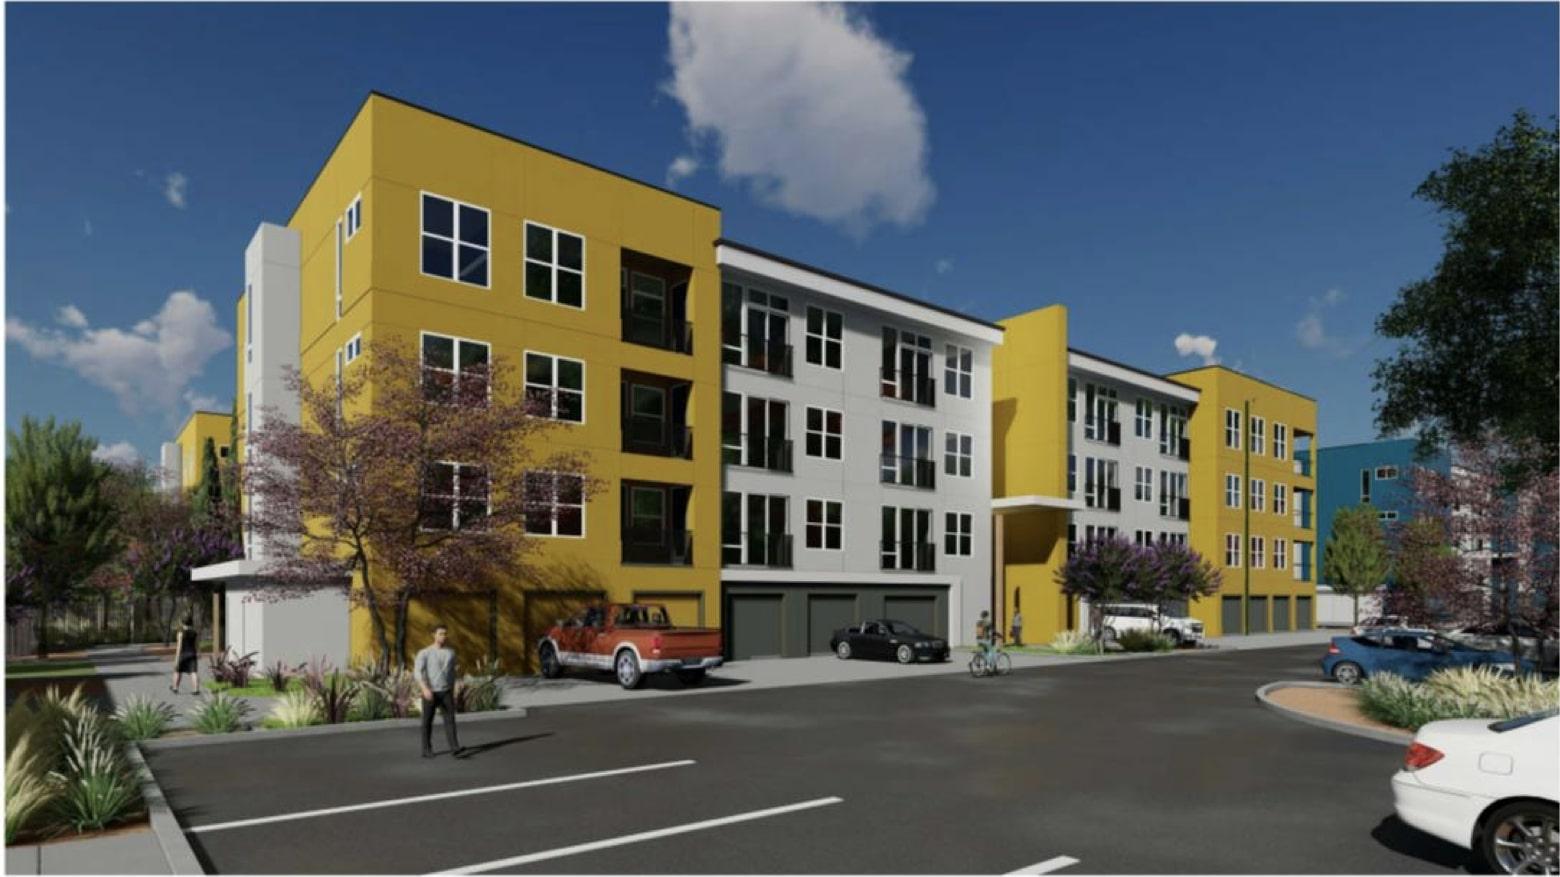 Klotz Ranch Apartments in Sacramento, rendering by Kephart Architects